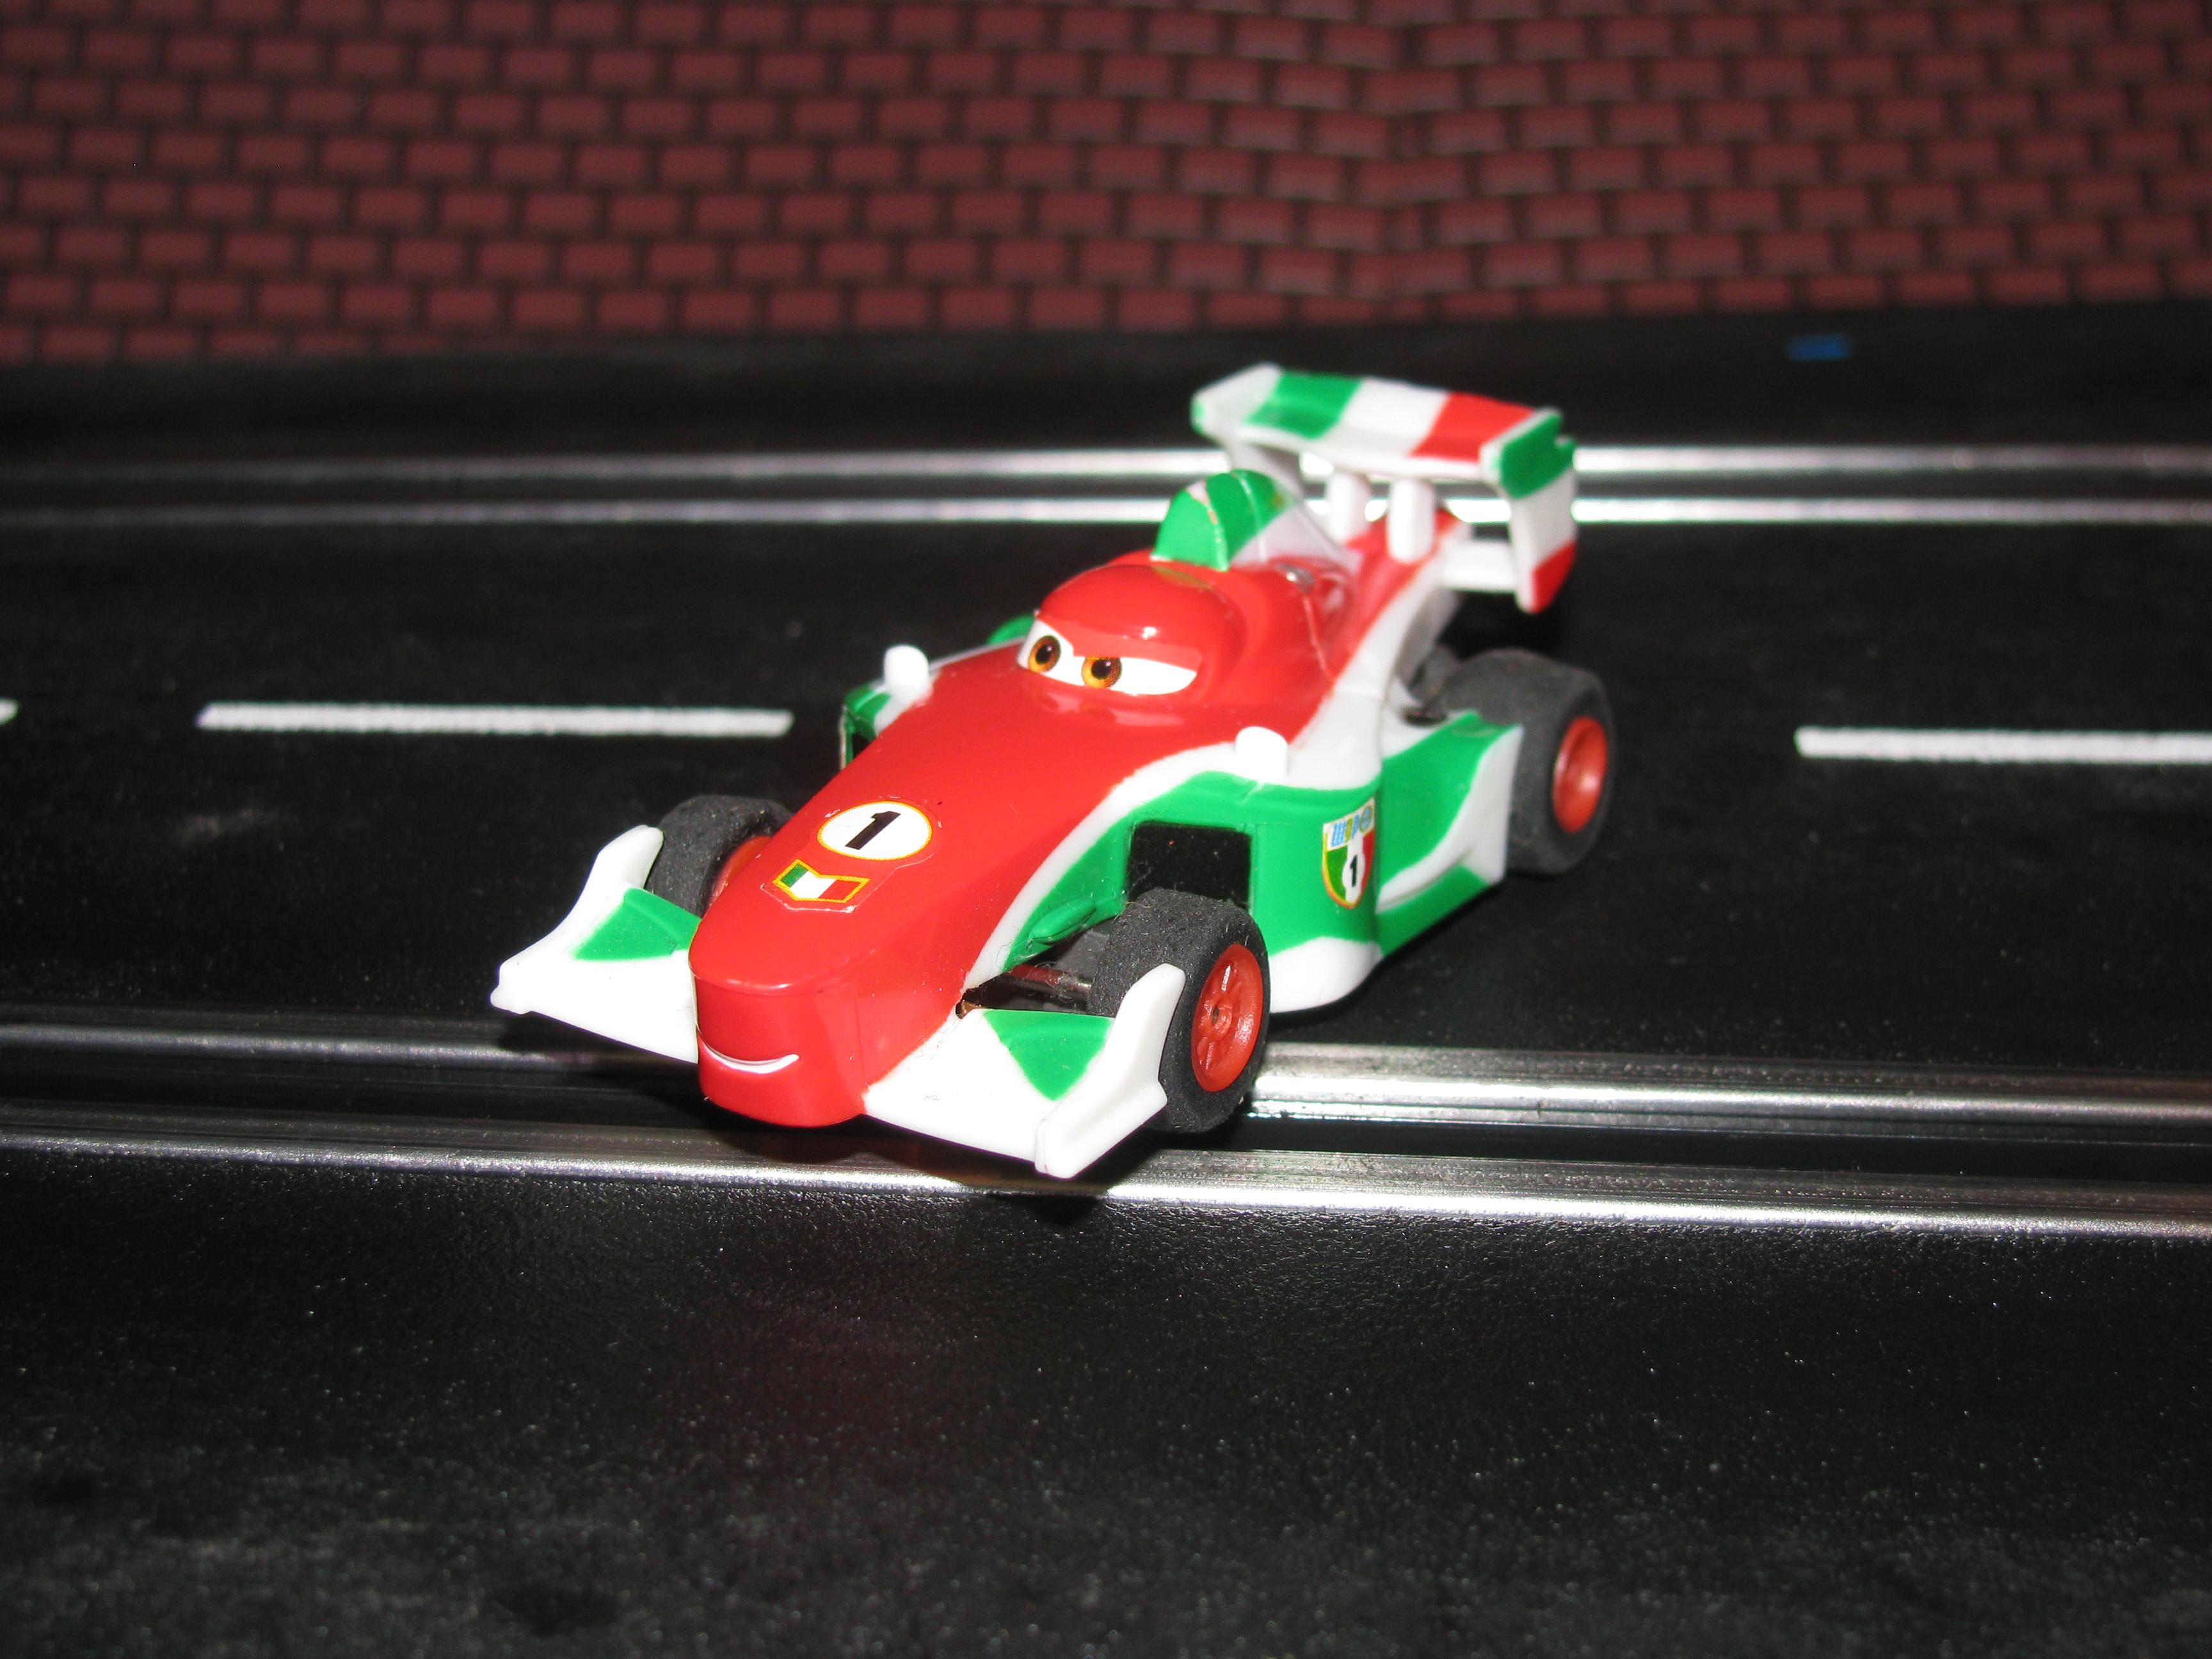 0 - SOLD - HO Formula One Slot Car #1 Francesco Bernoulli (Disney/Pixar) NO GUIDE POST